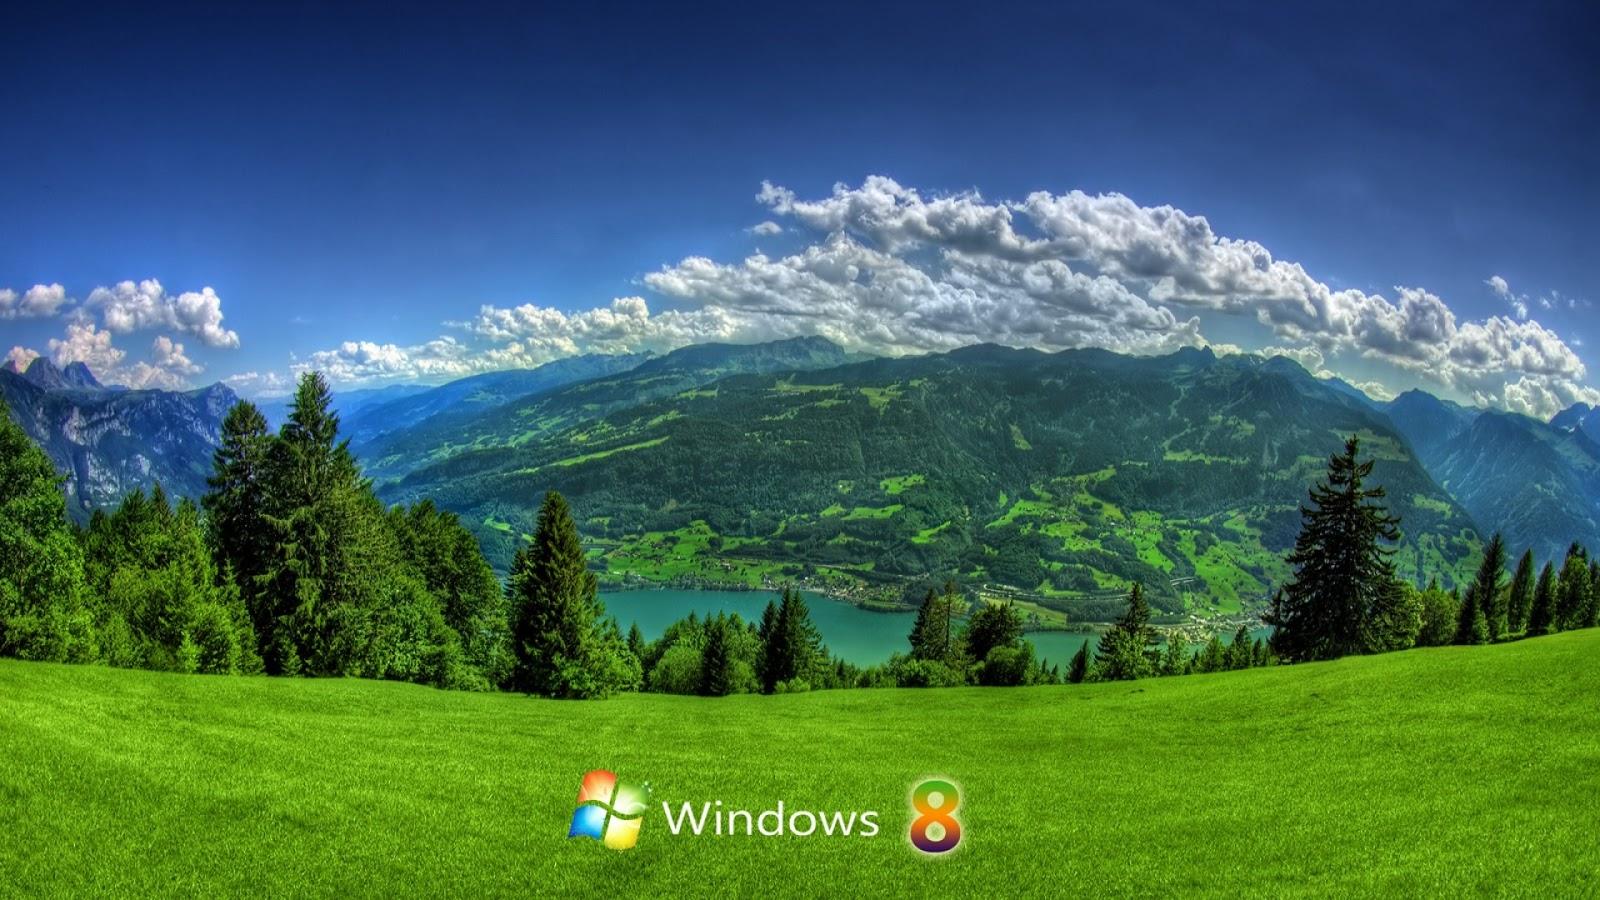 Windows 8 High Resolution